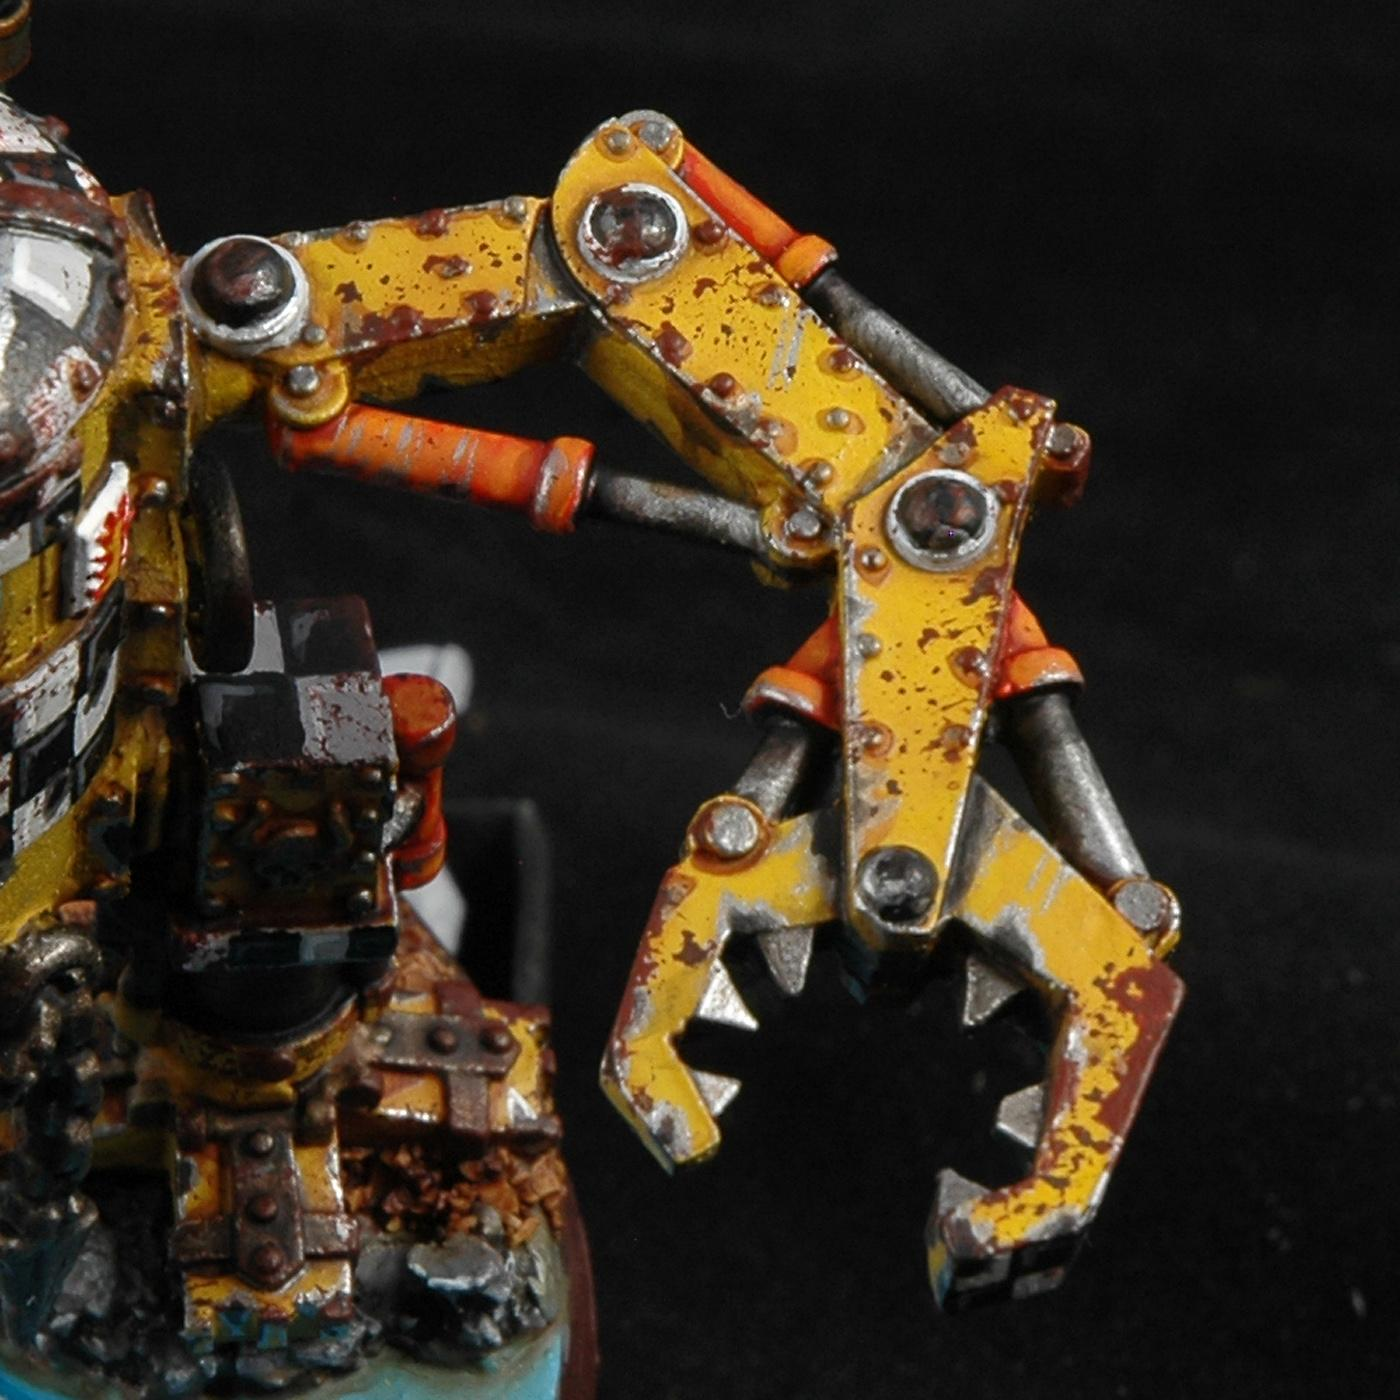 Methods, Orks, Rust, Warhammer 40,000, Work In Progress